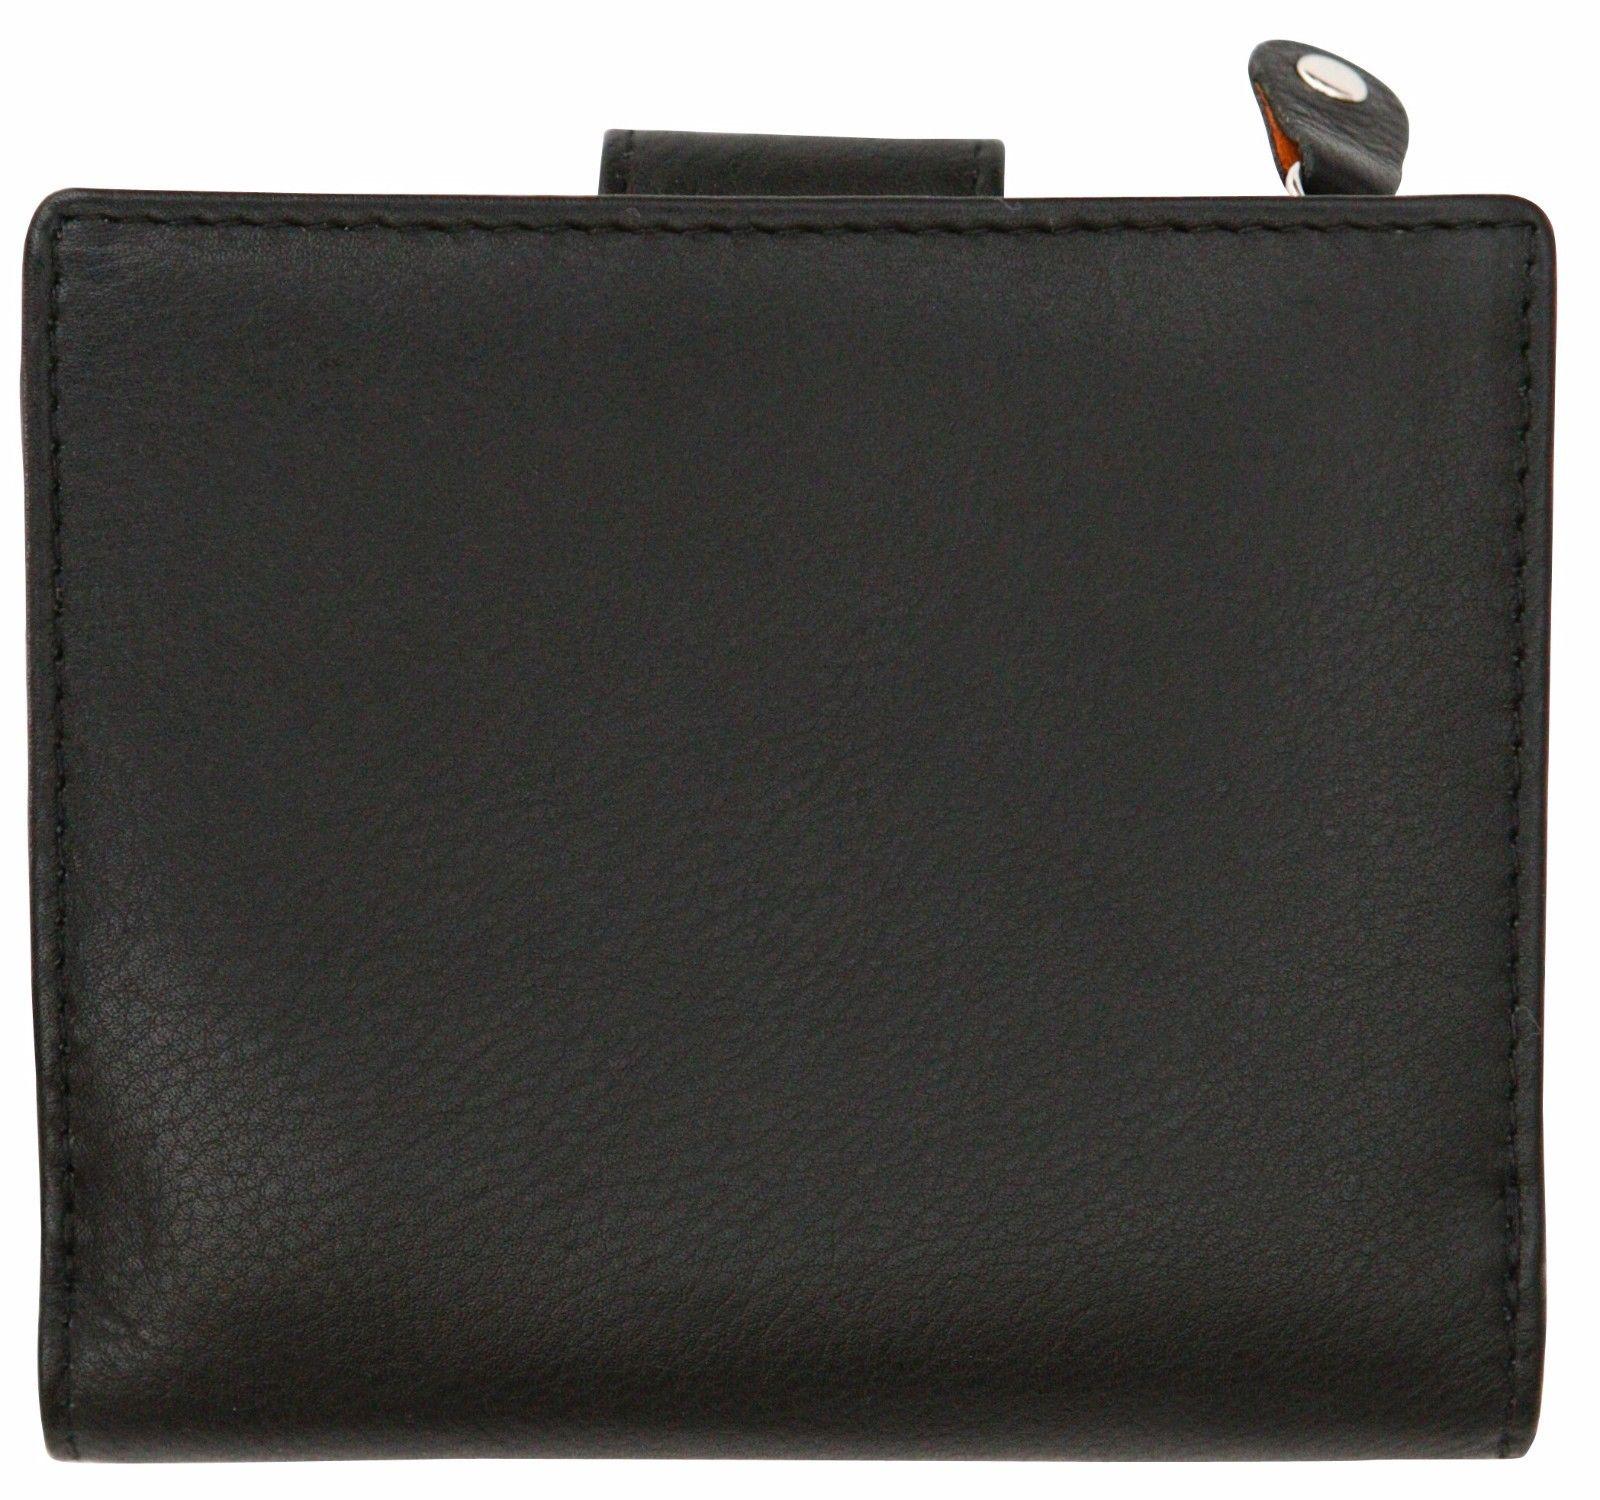 Felda-RFID-onorevoli-MEDAGLIA-amp-Card-Purse-Wallet-Genuine-Leather-Multi-SOFT-BOX-REGALO miniatura 12